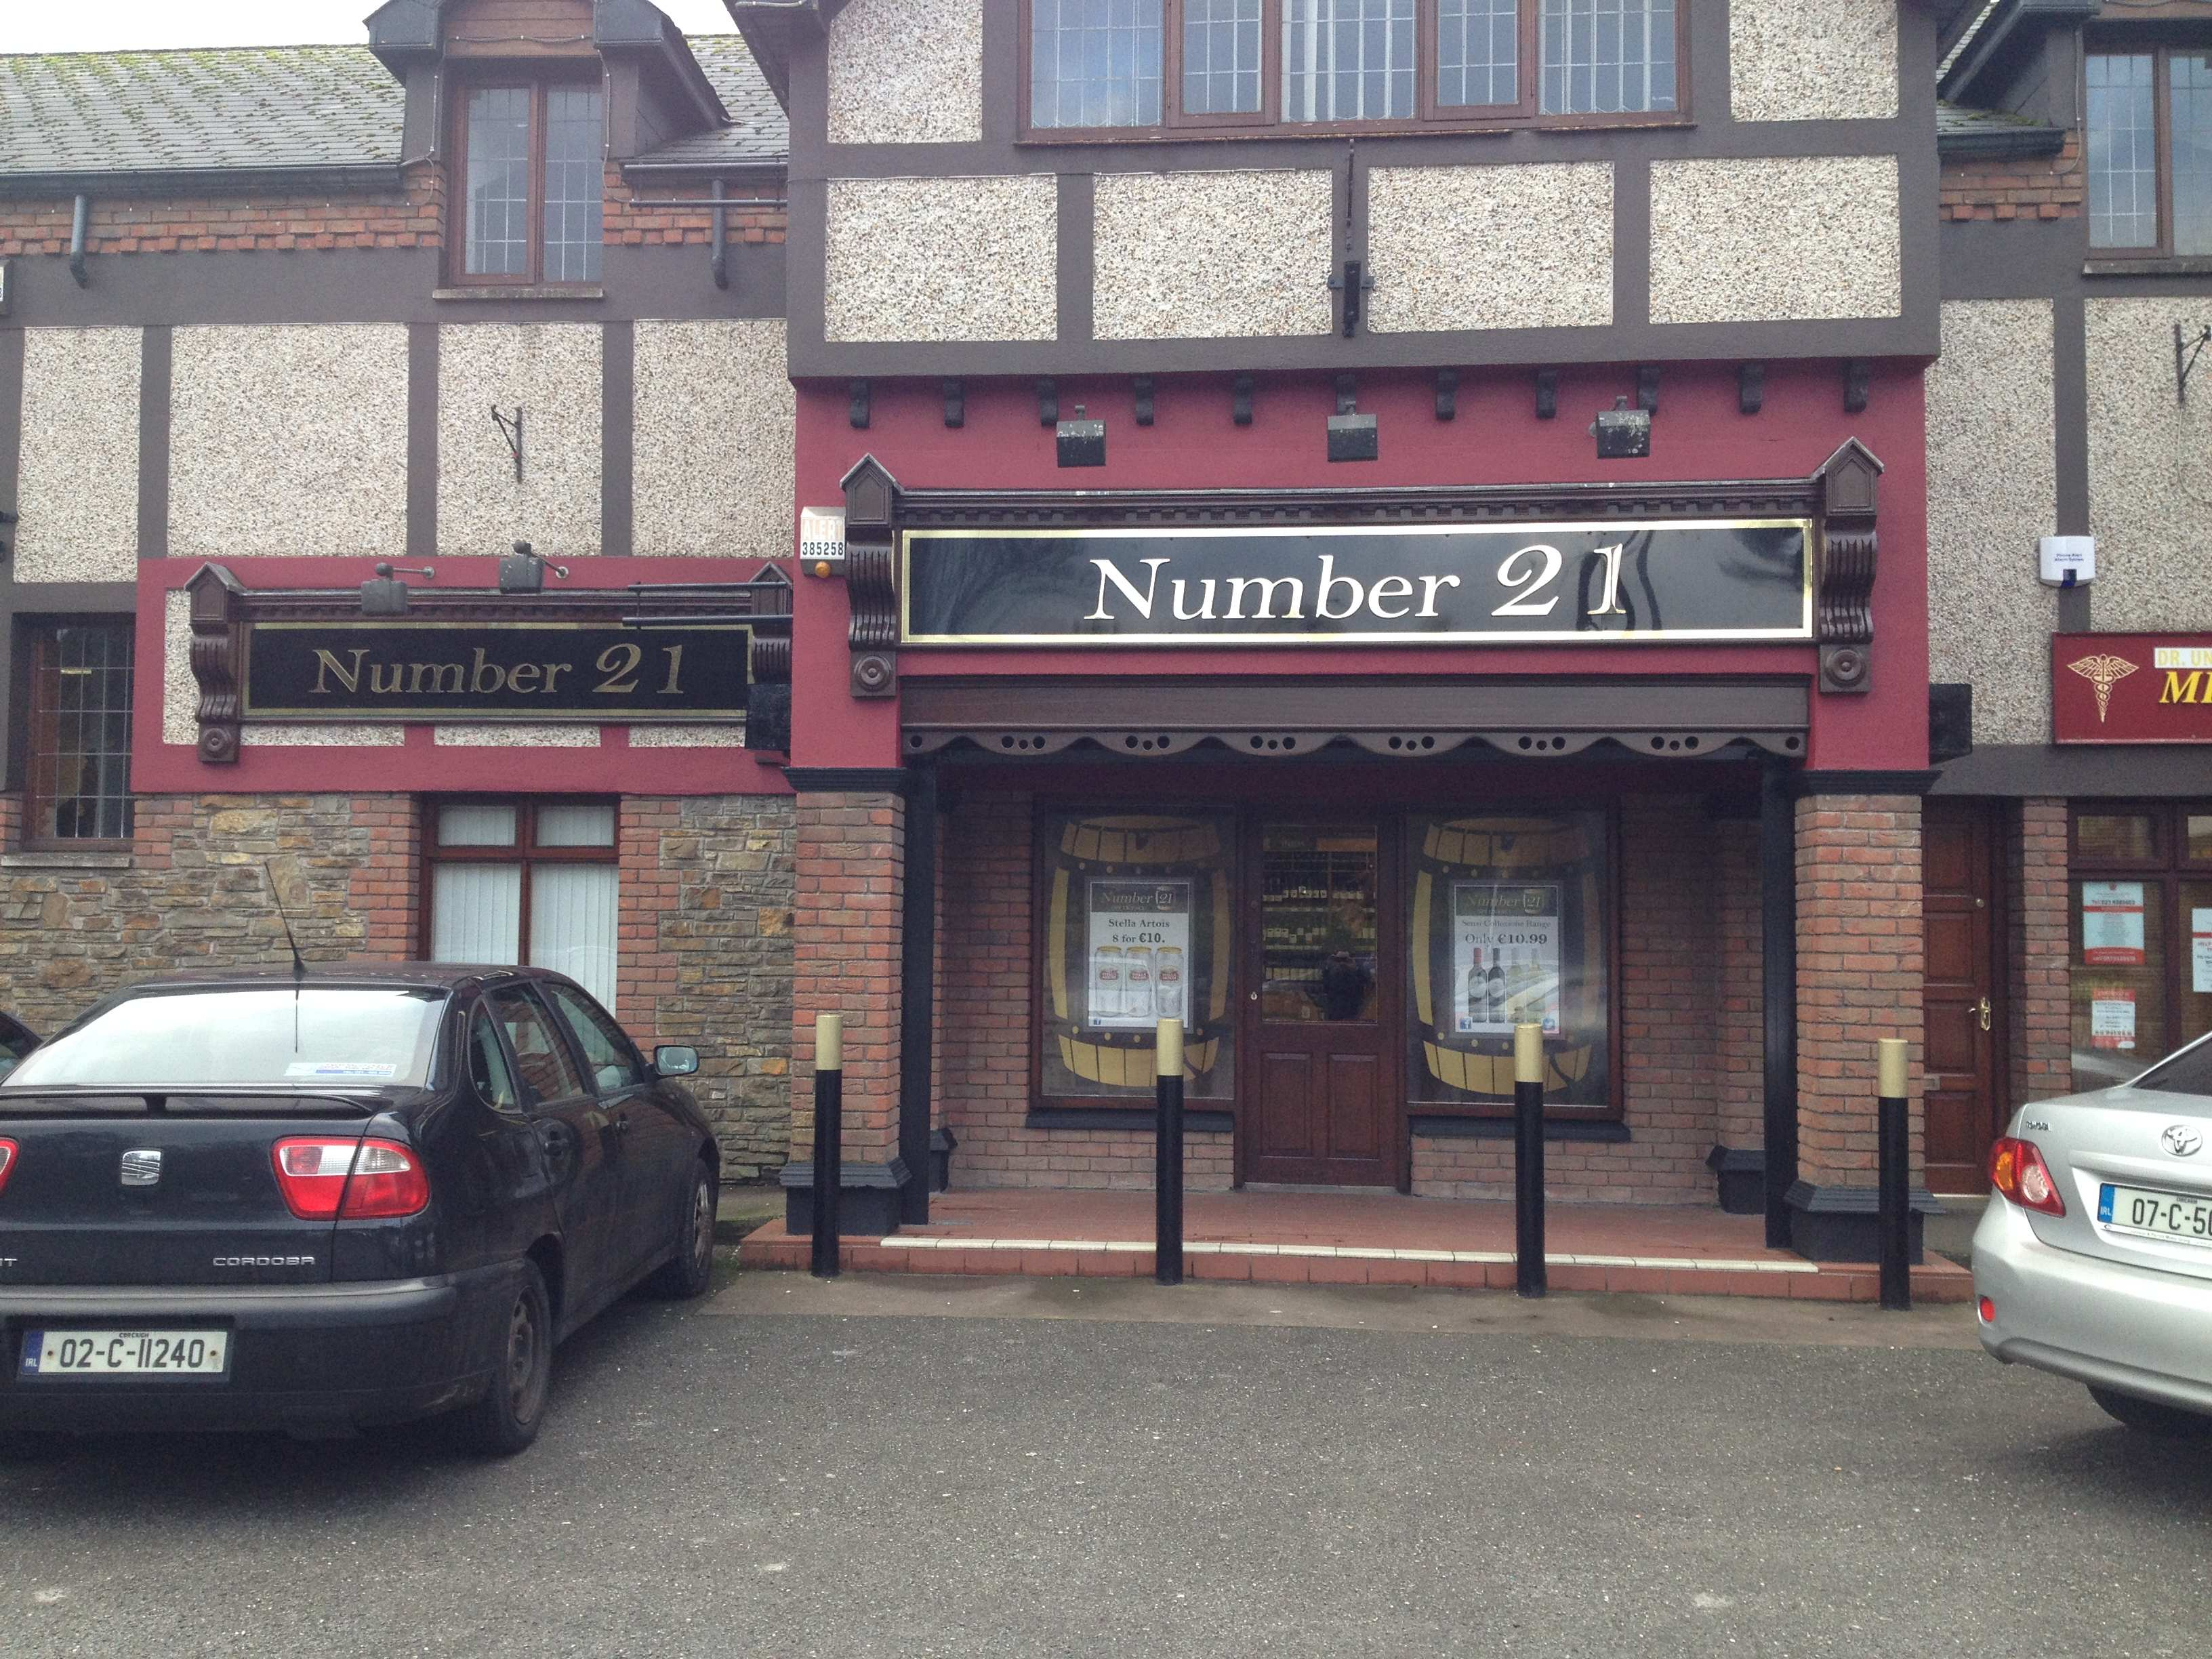 putside Blarney 2014-11-28 14.23.39